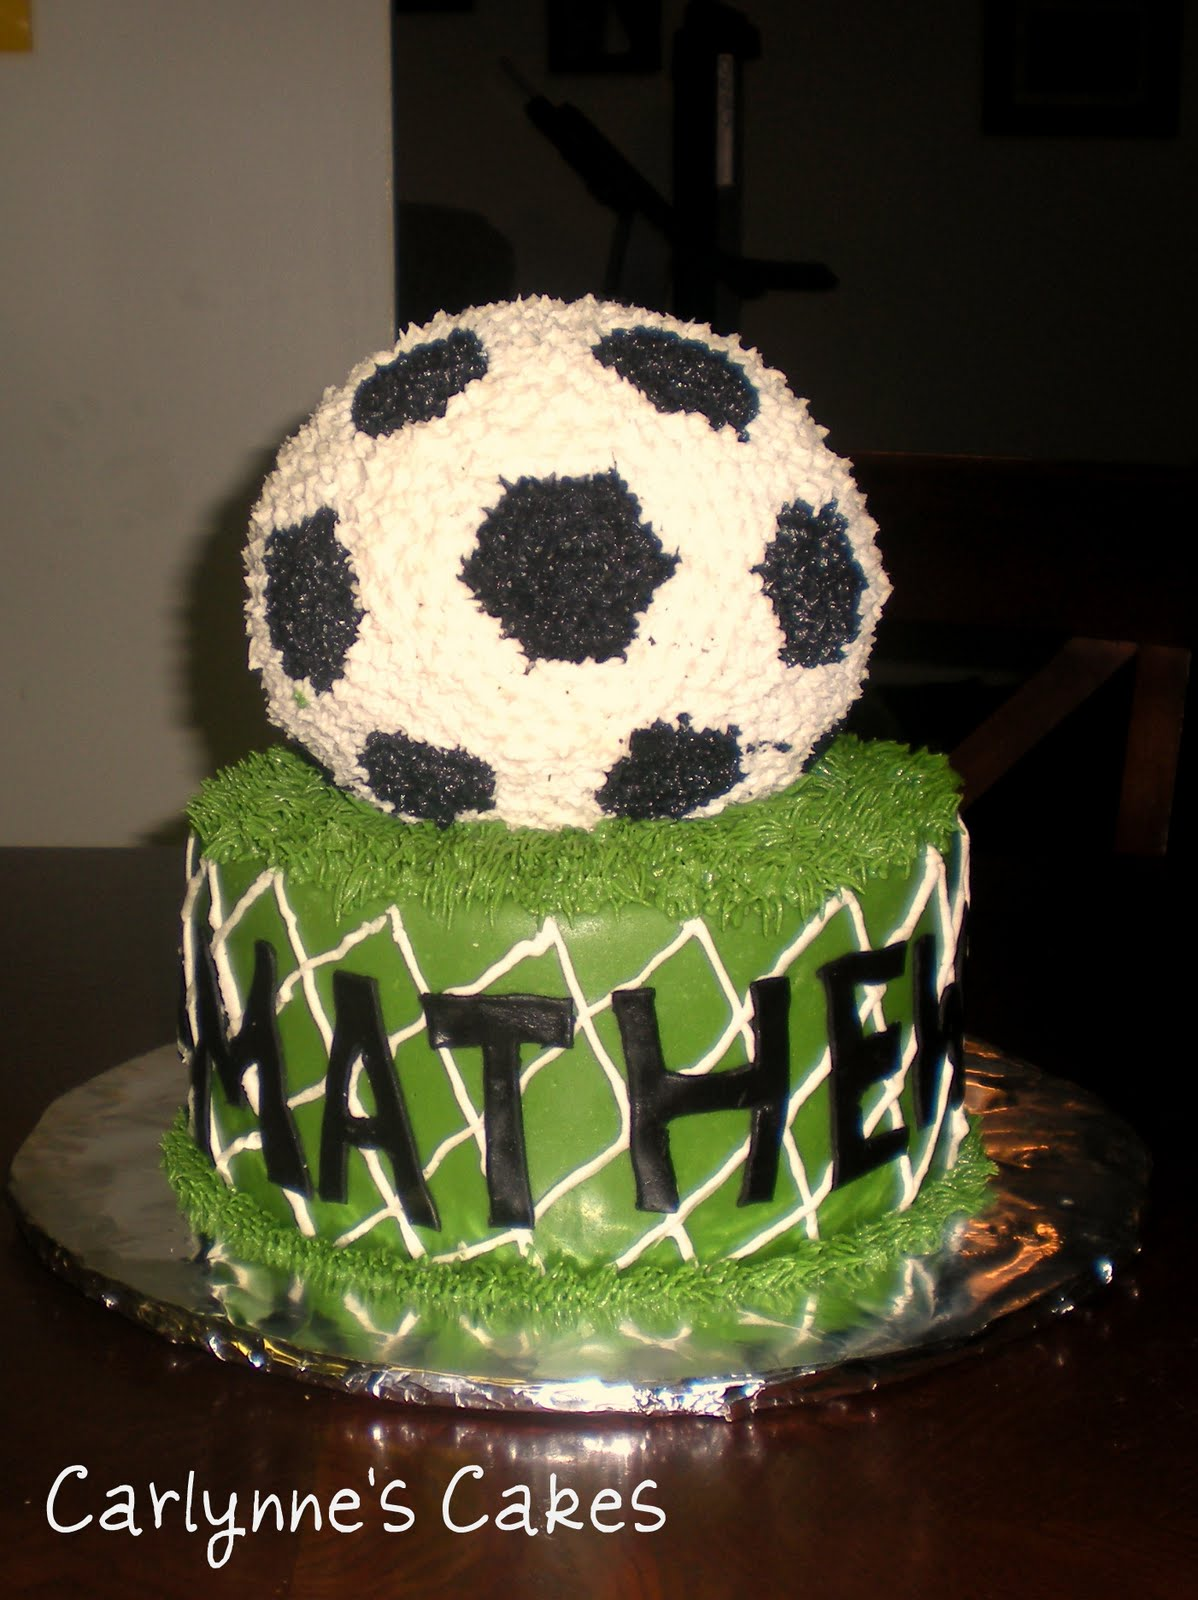 Images Of Soccer Cake : Carlynne s Cakes: Soccer Cake